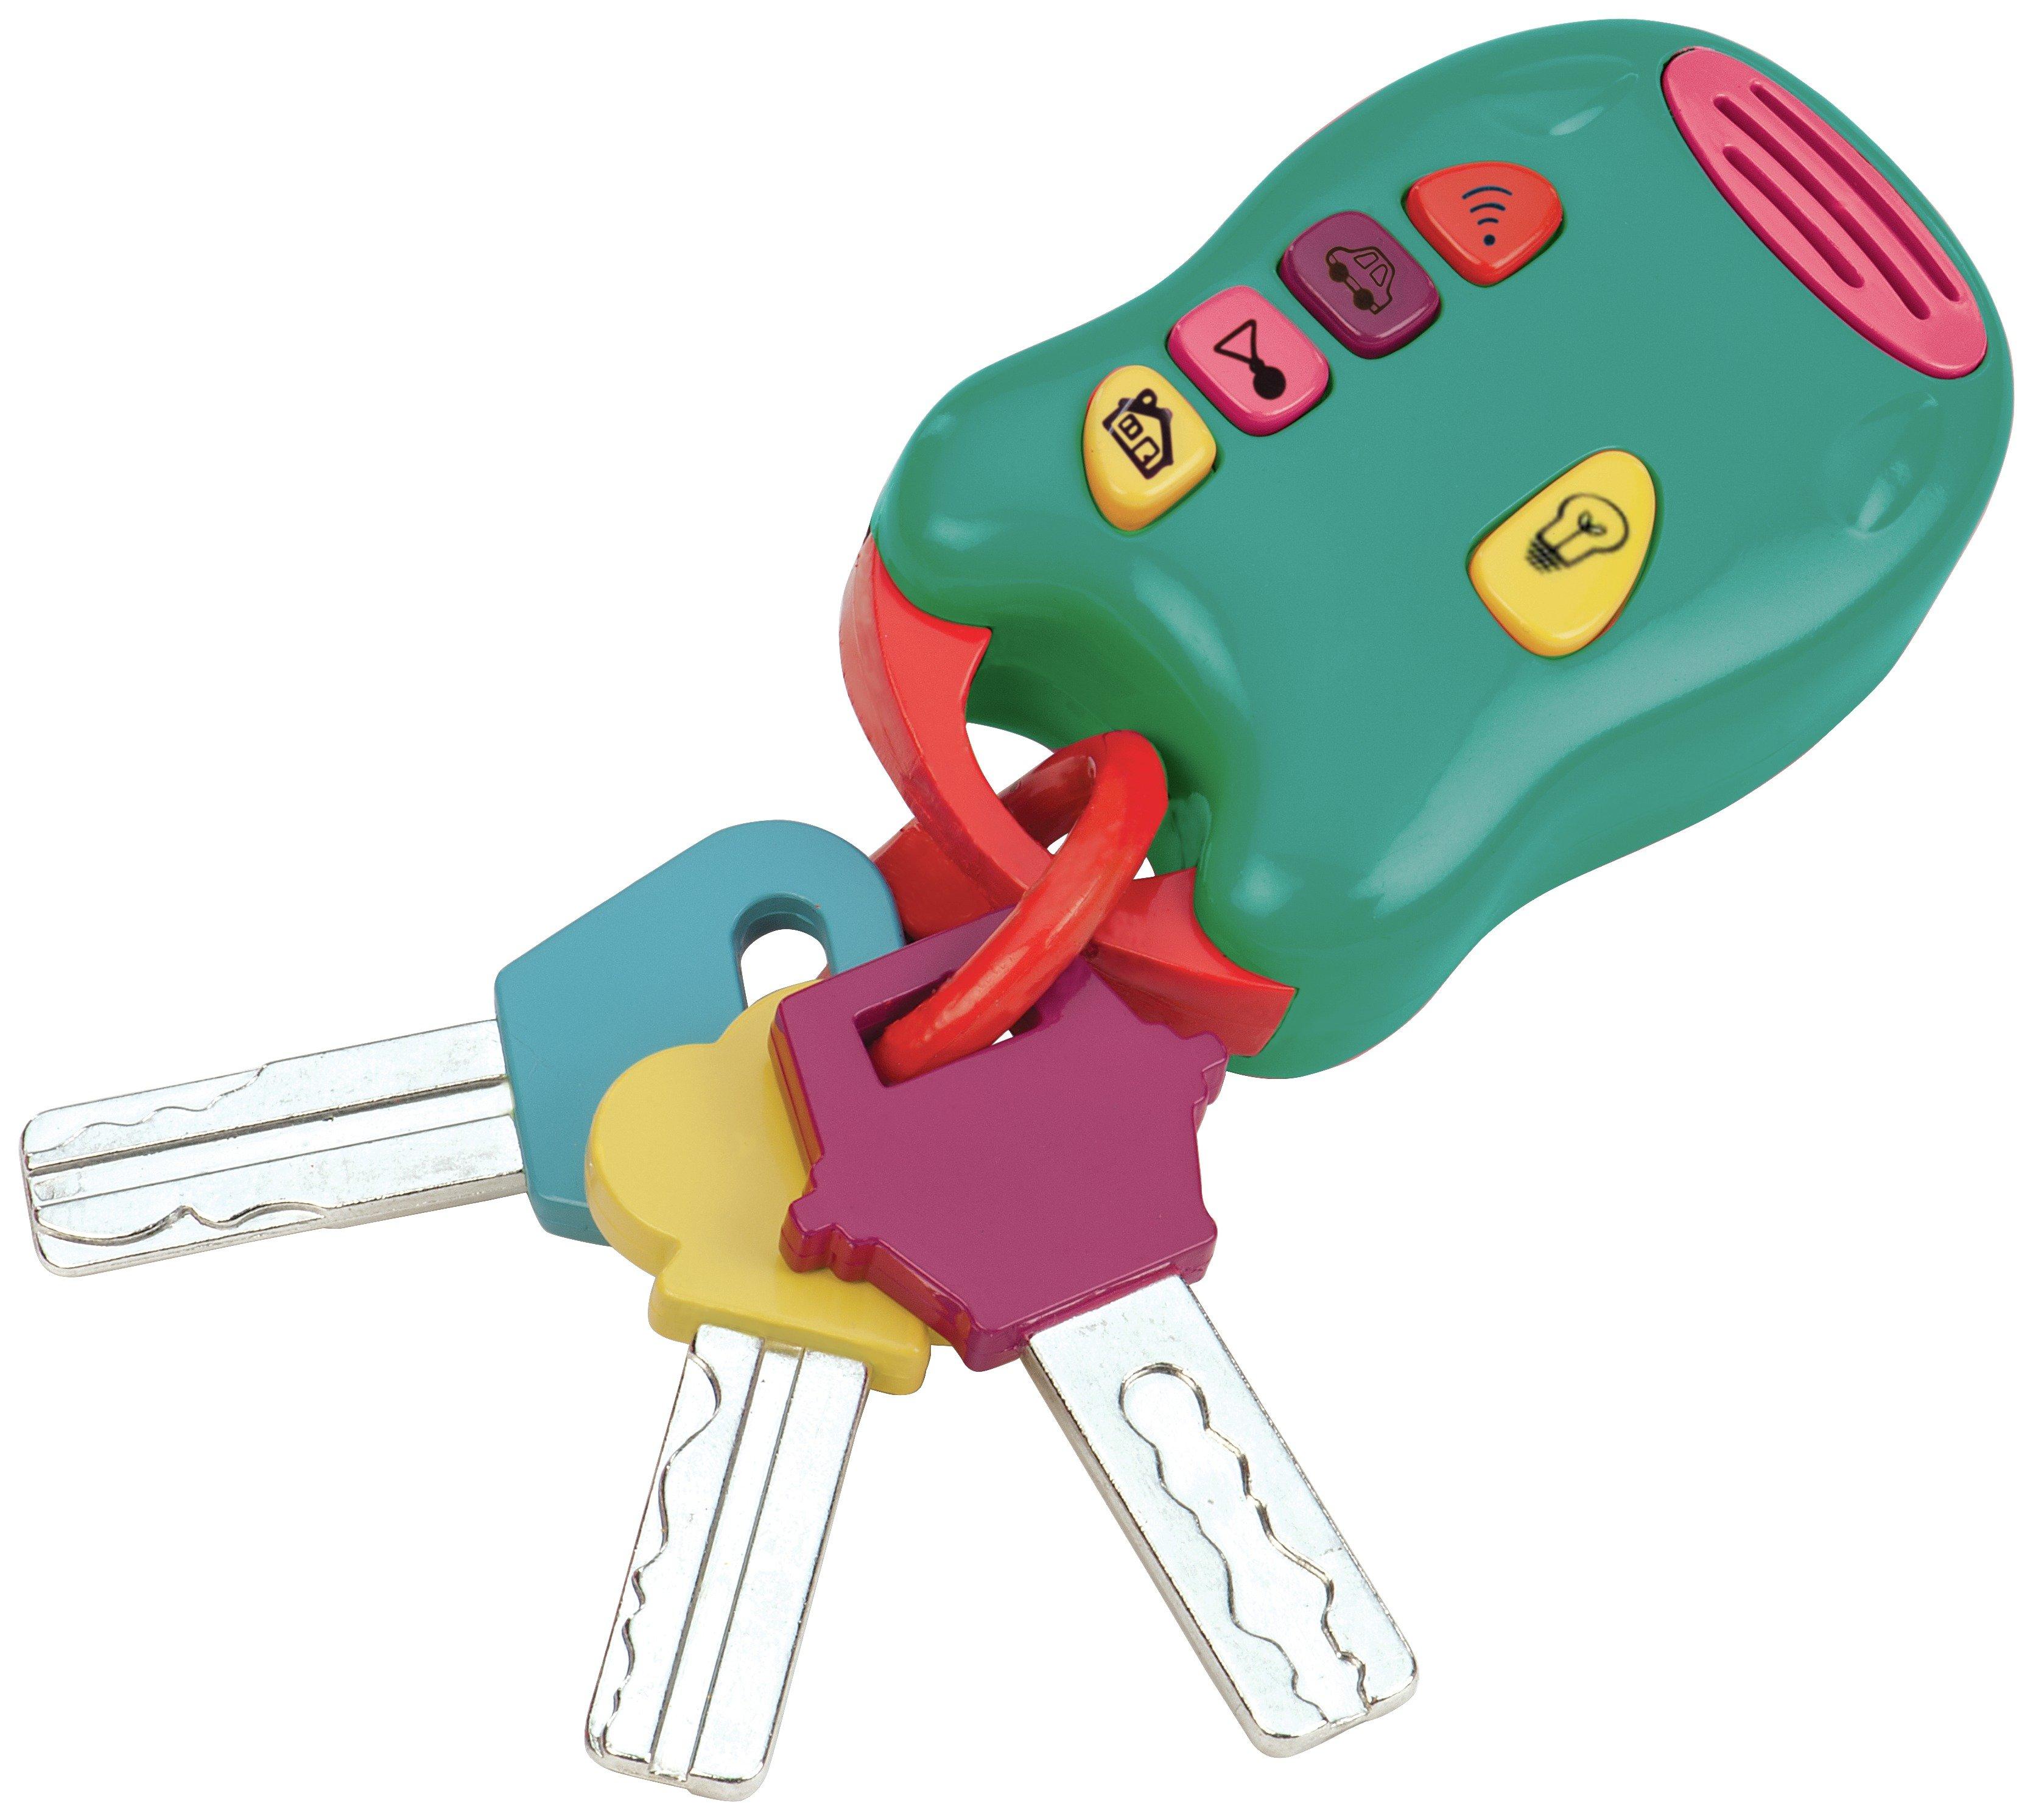 Image of Battat - Light and Sound Keys